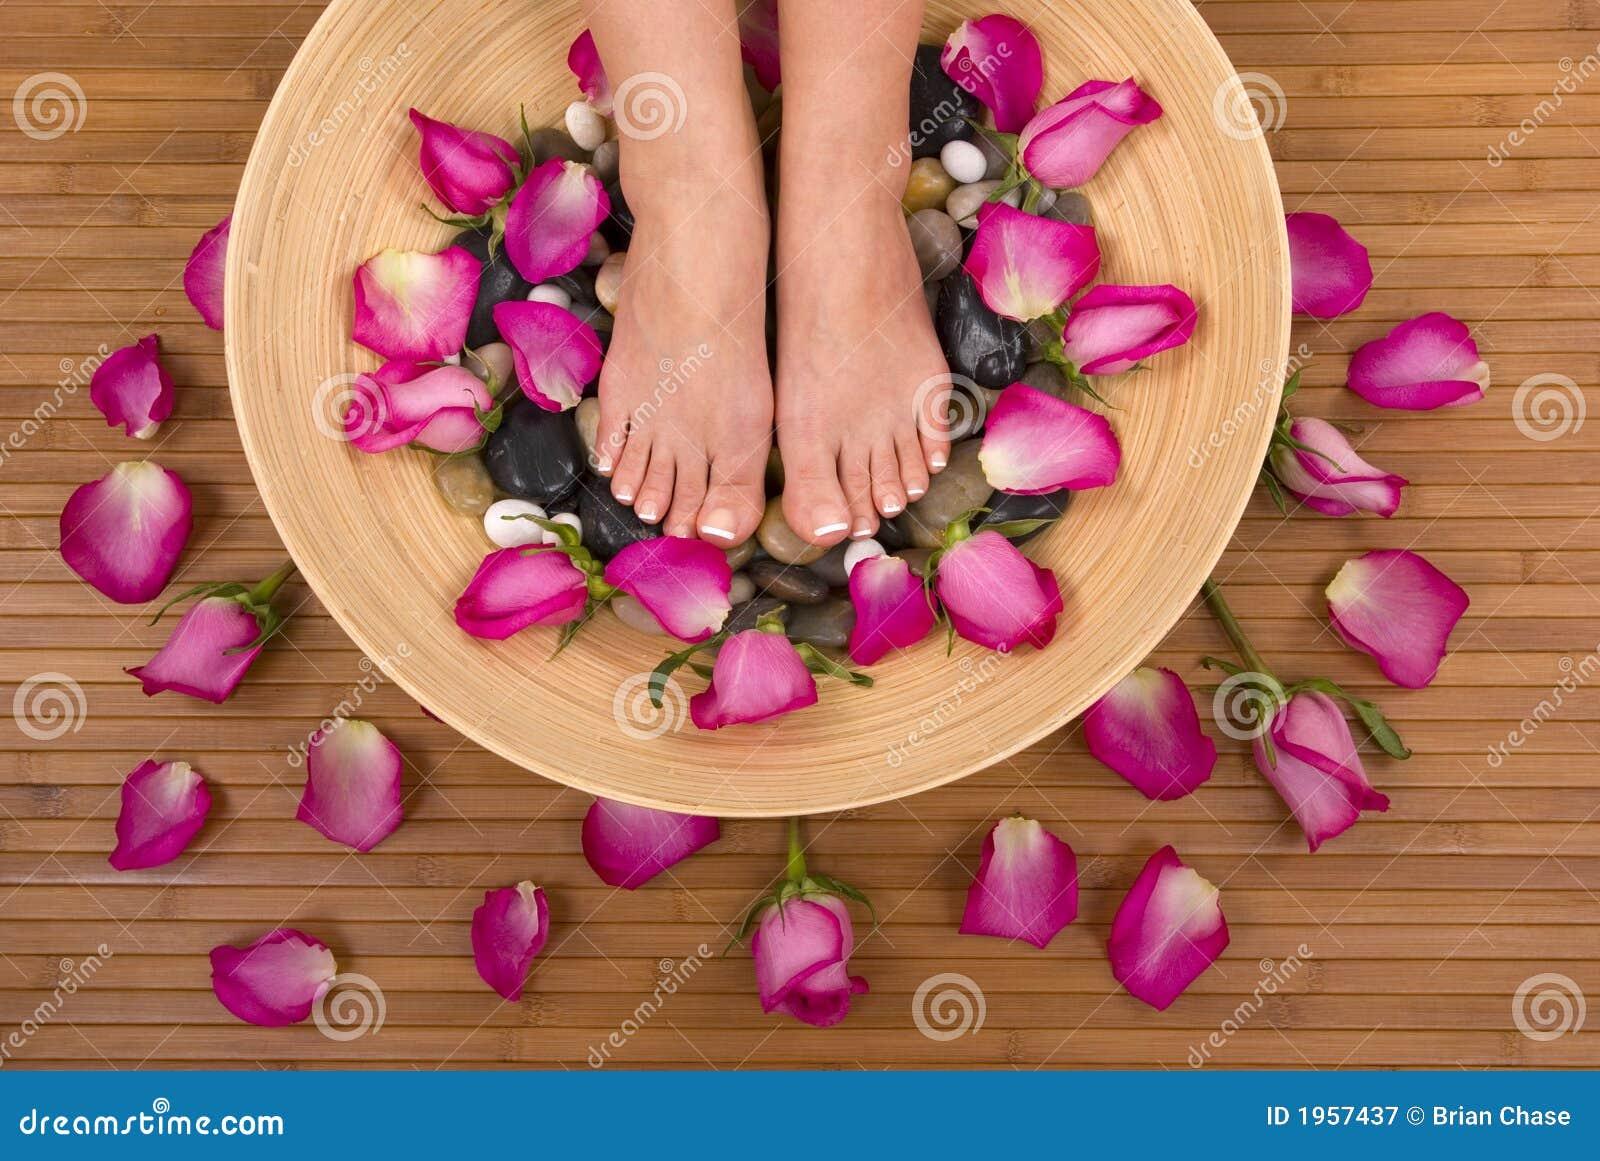 Pedicure Spa Treatment